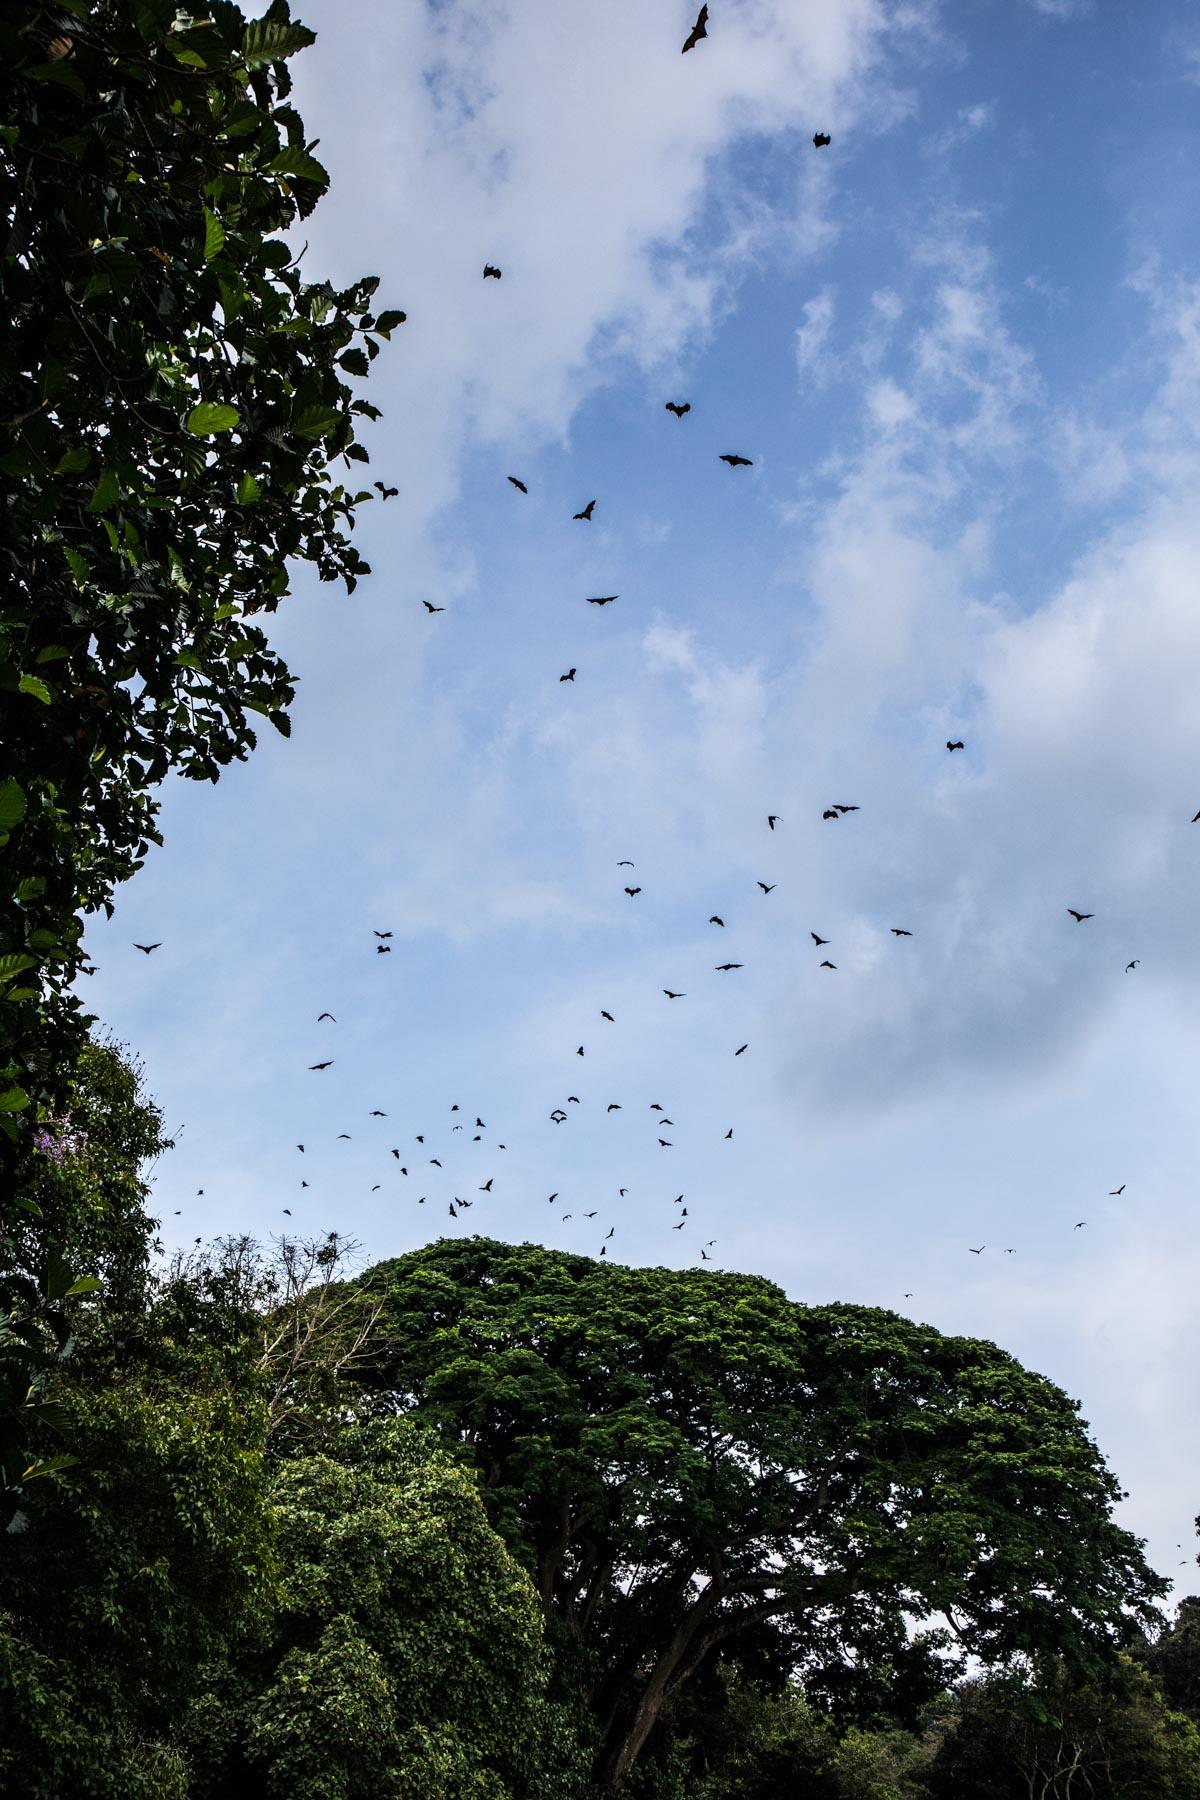 Bats Flying in the Royal Botanical Gardens (Peradeniya Park), Kandy, Sri Lanka. Photographed by Shika Finnemore - thebellephant.com